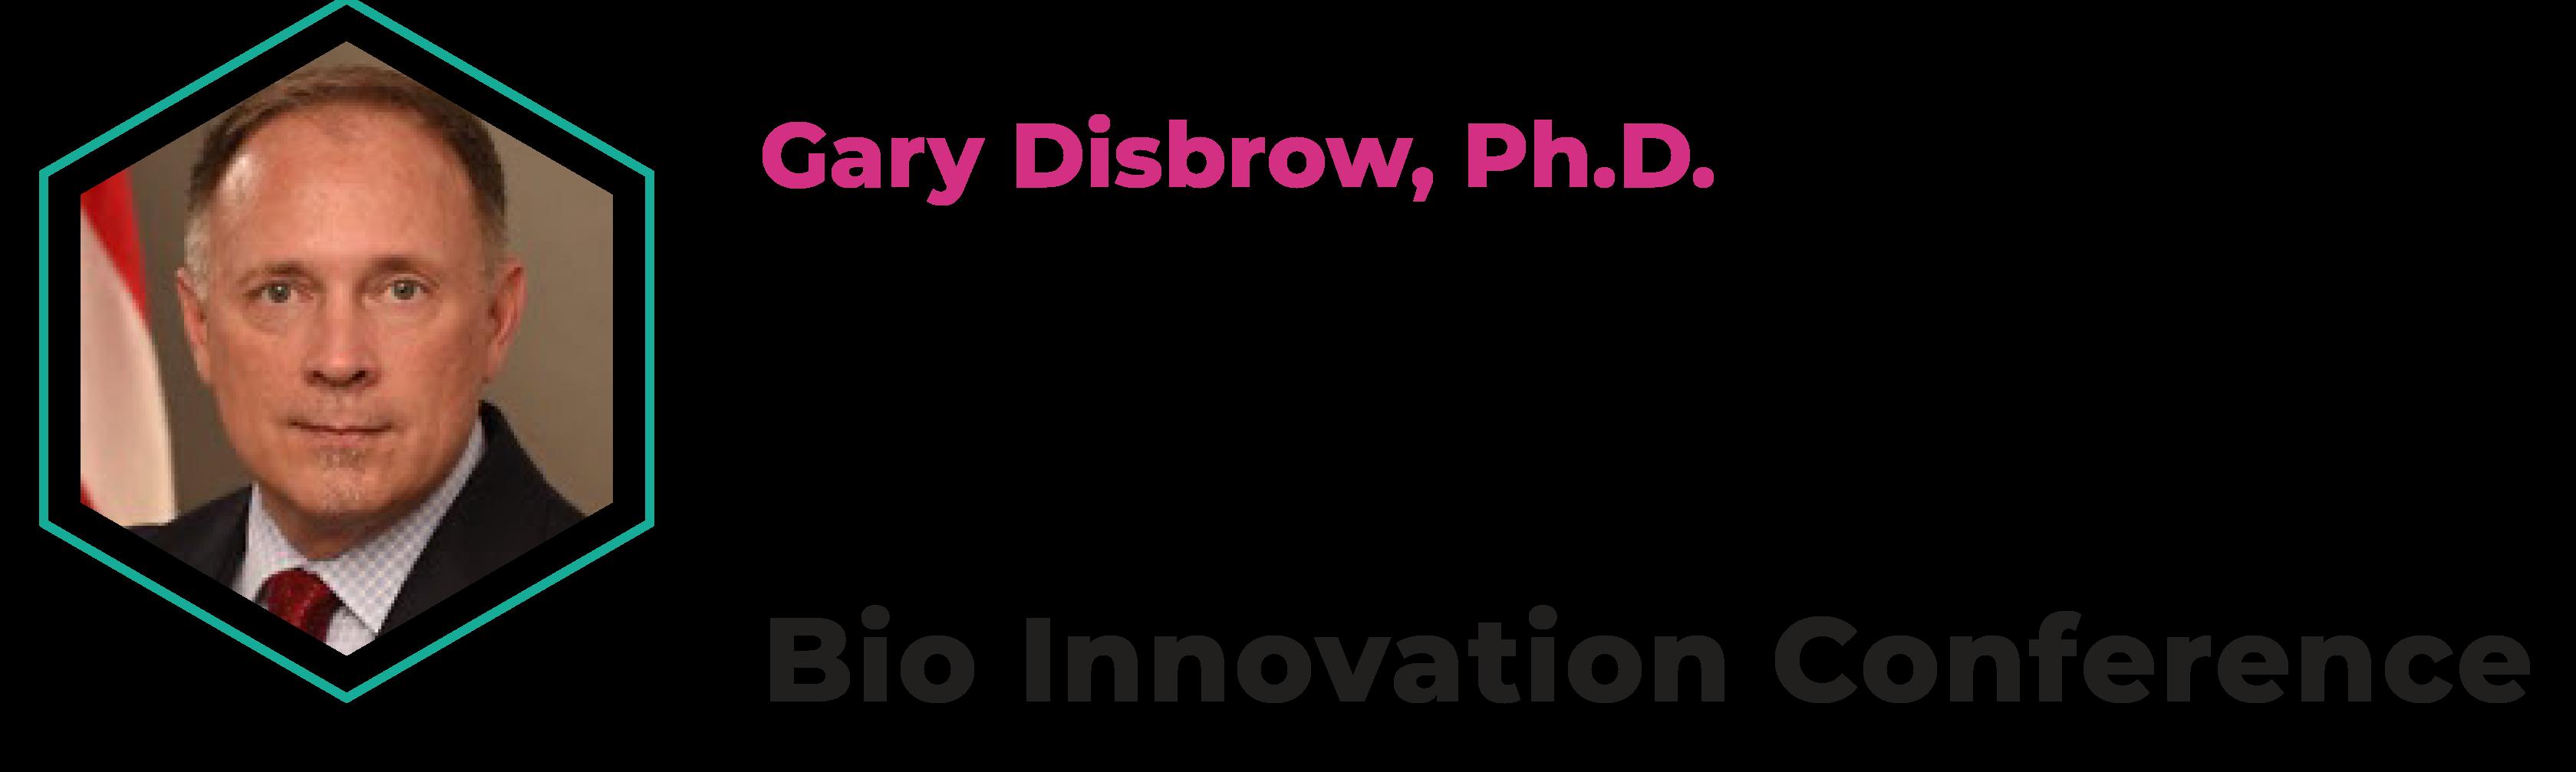 Maryland Life Sciences Bio Innovation Conference